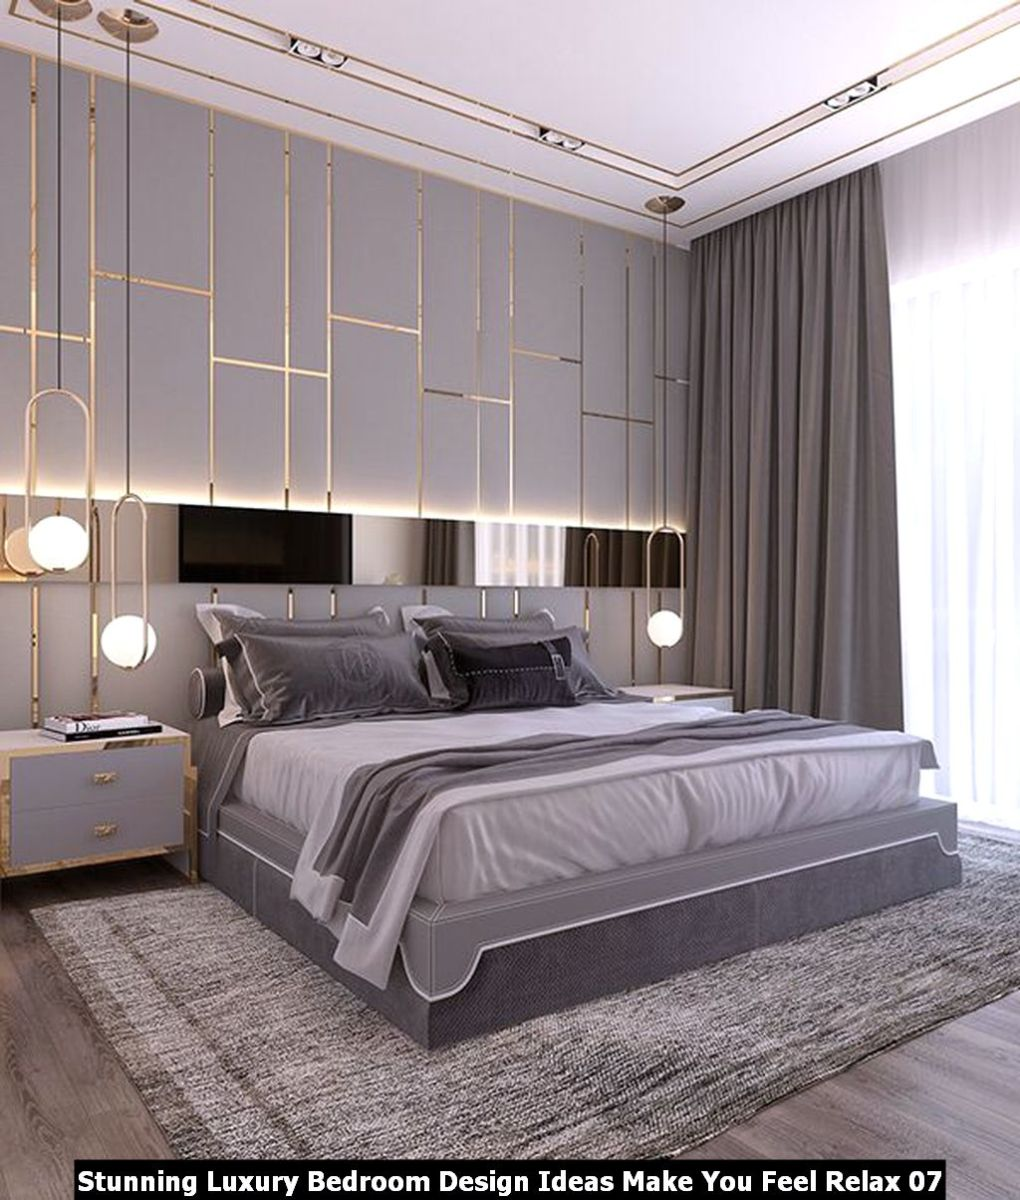 Stunning Luxury Bedroom Design Ideas Make You Feel Relax 07